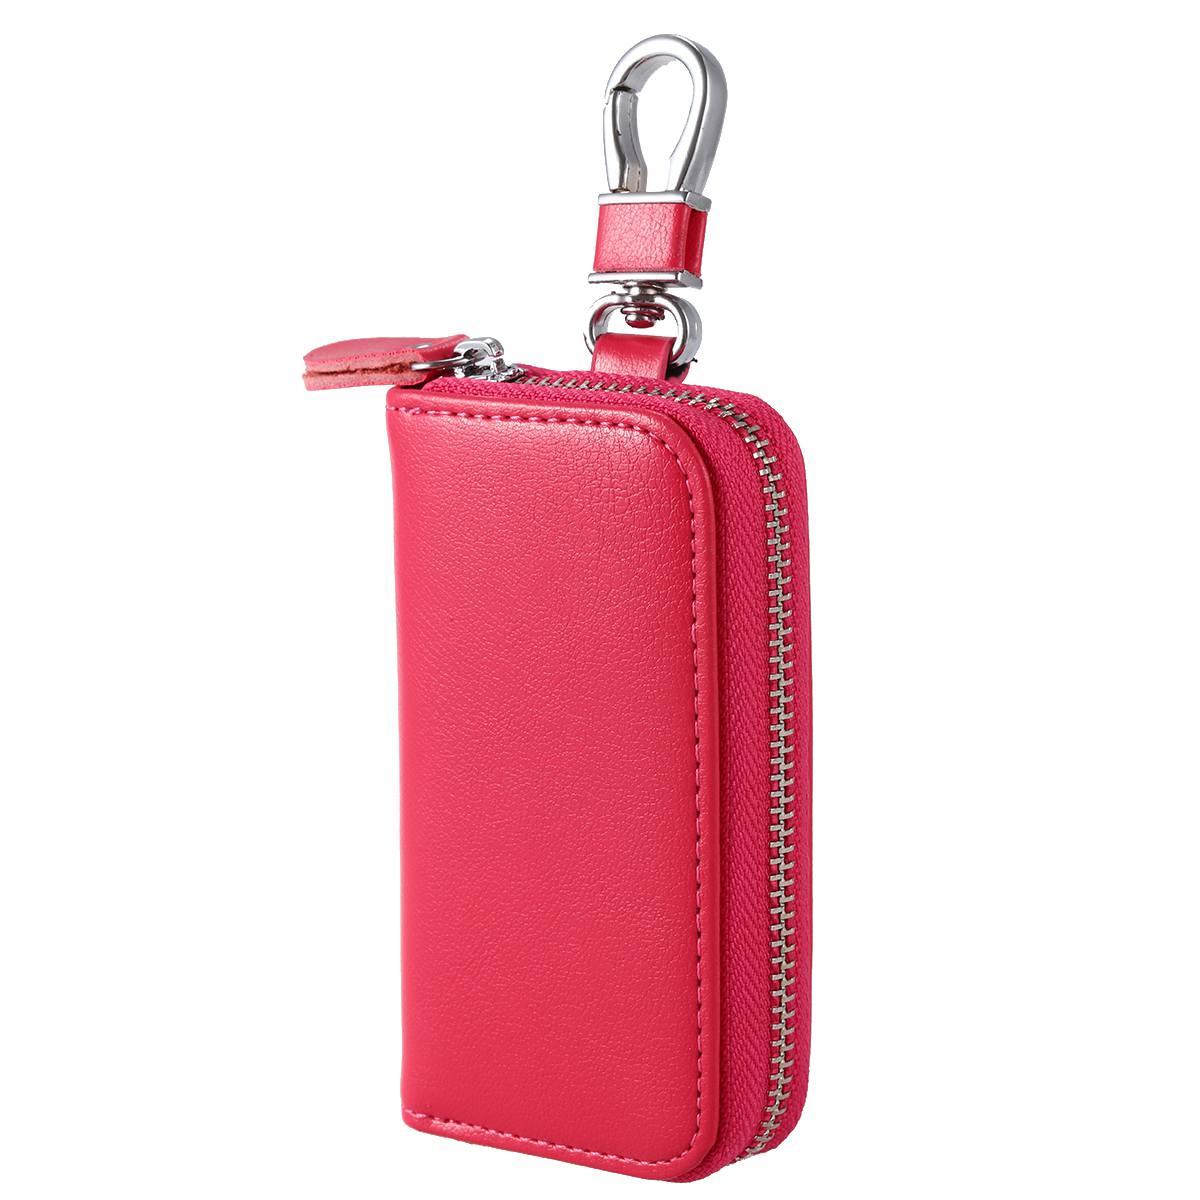 f3e22d51e9ee1 FGGS Men Leather Zip Around 6 Hook Key Case Car Key Holder Wallet-in ...